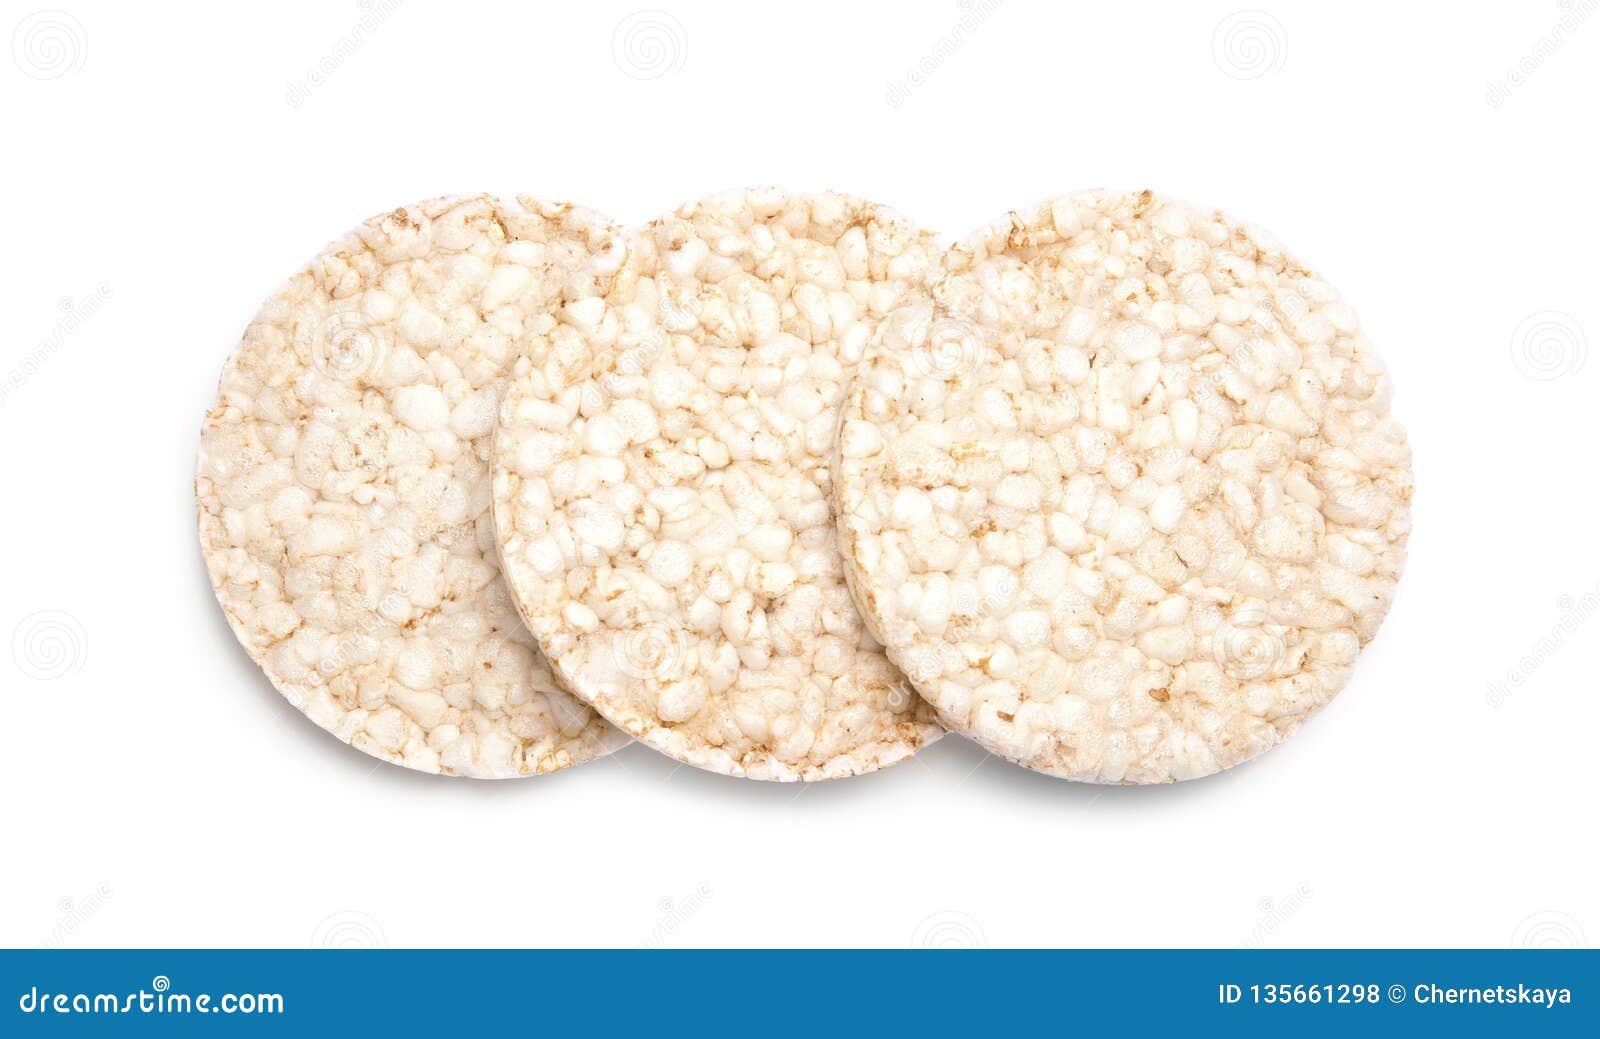 Crunchy rice cakes on white background